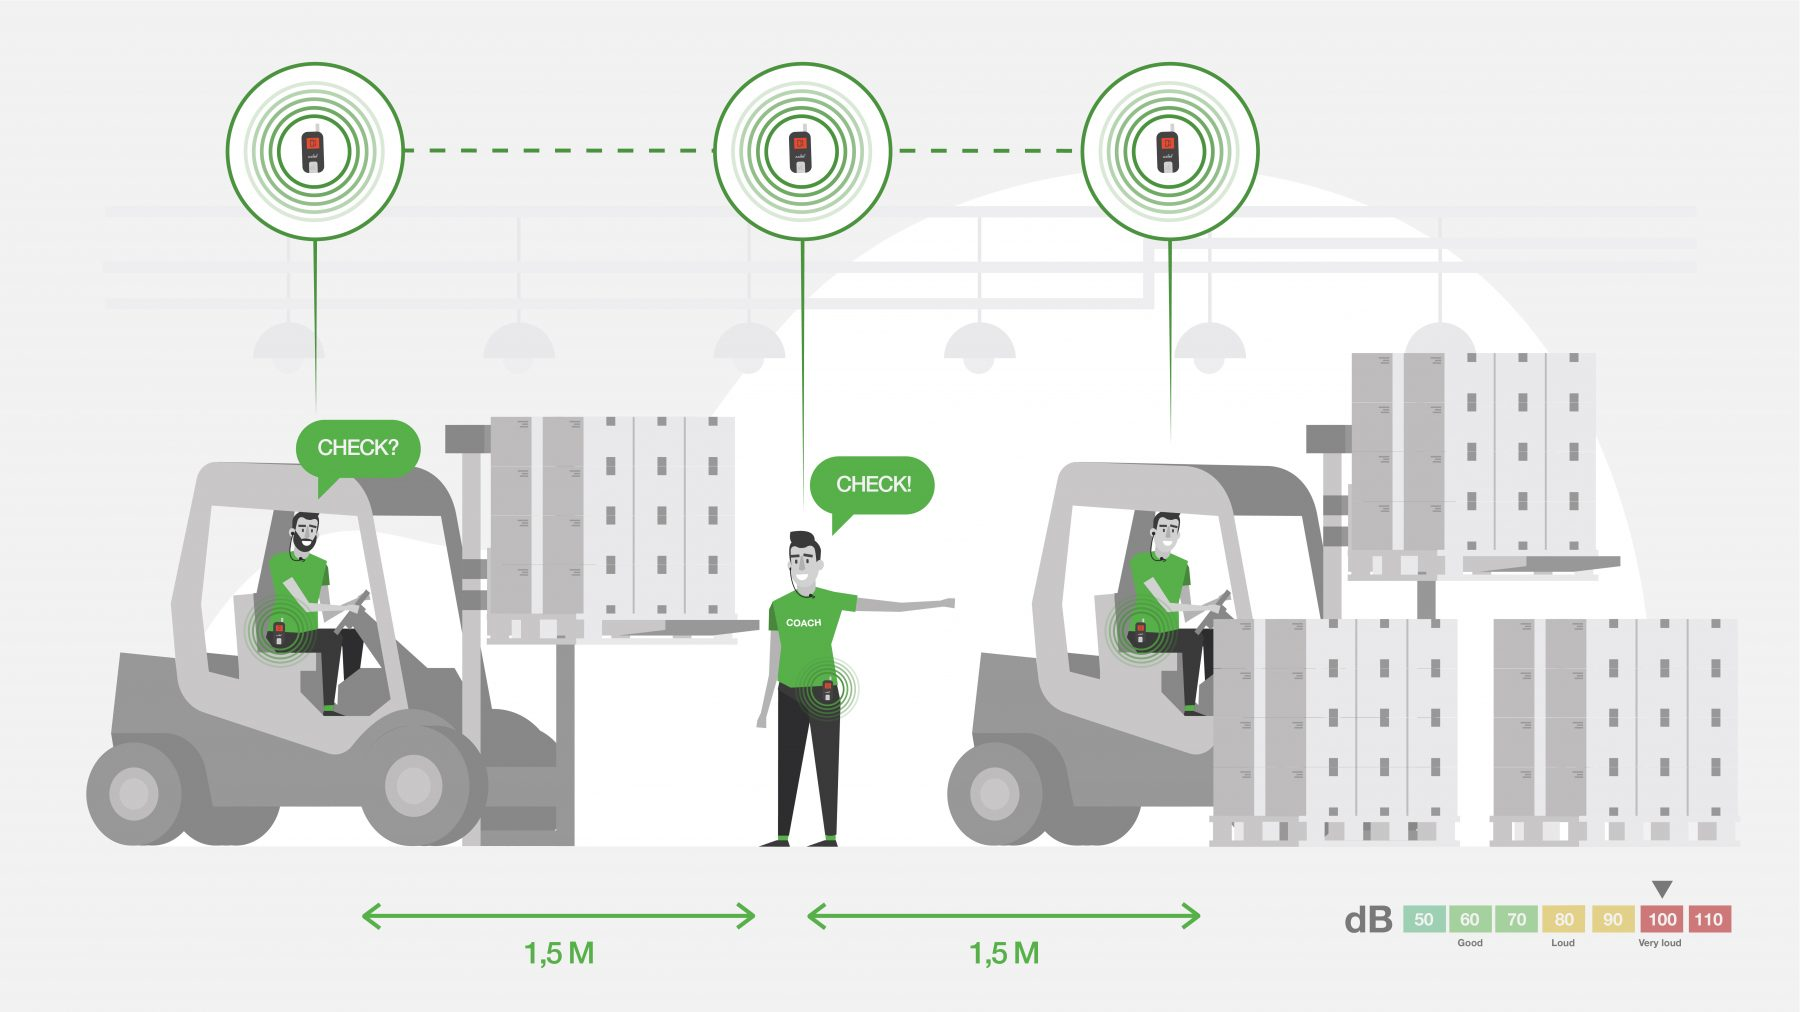 axiwi-draadloos-duplex-communicatiesysteem-veilig-hygiene-fabriek-opleiden-personeel